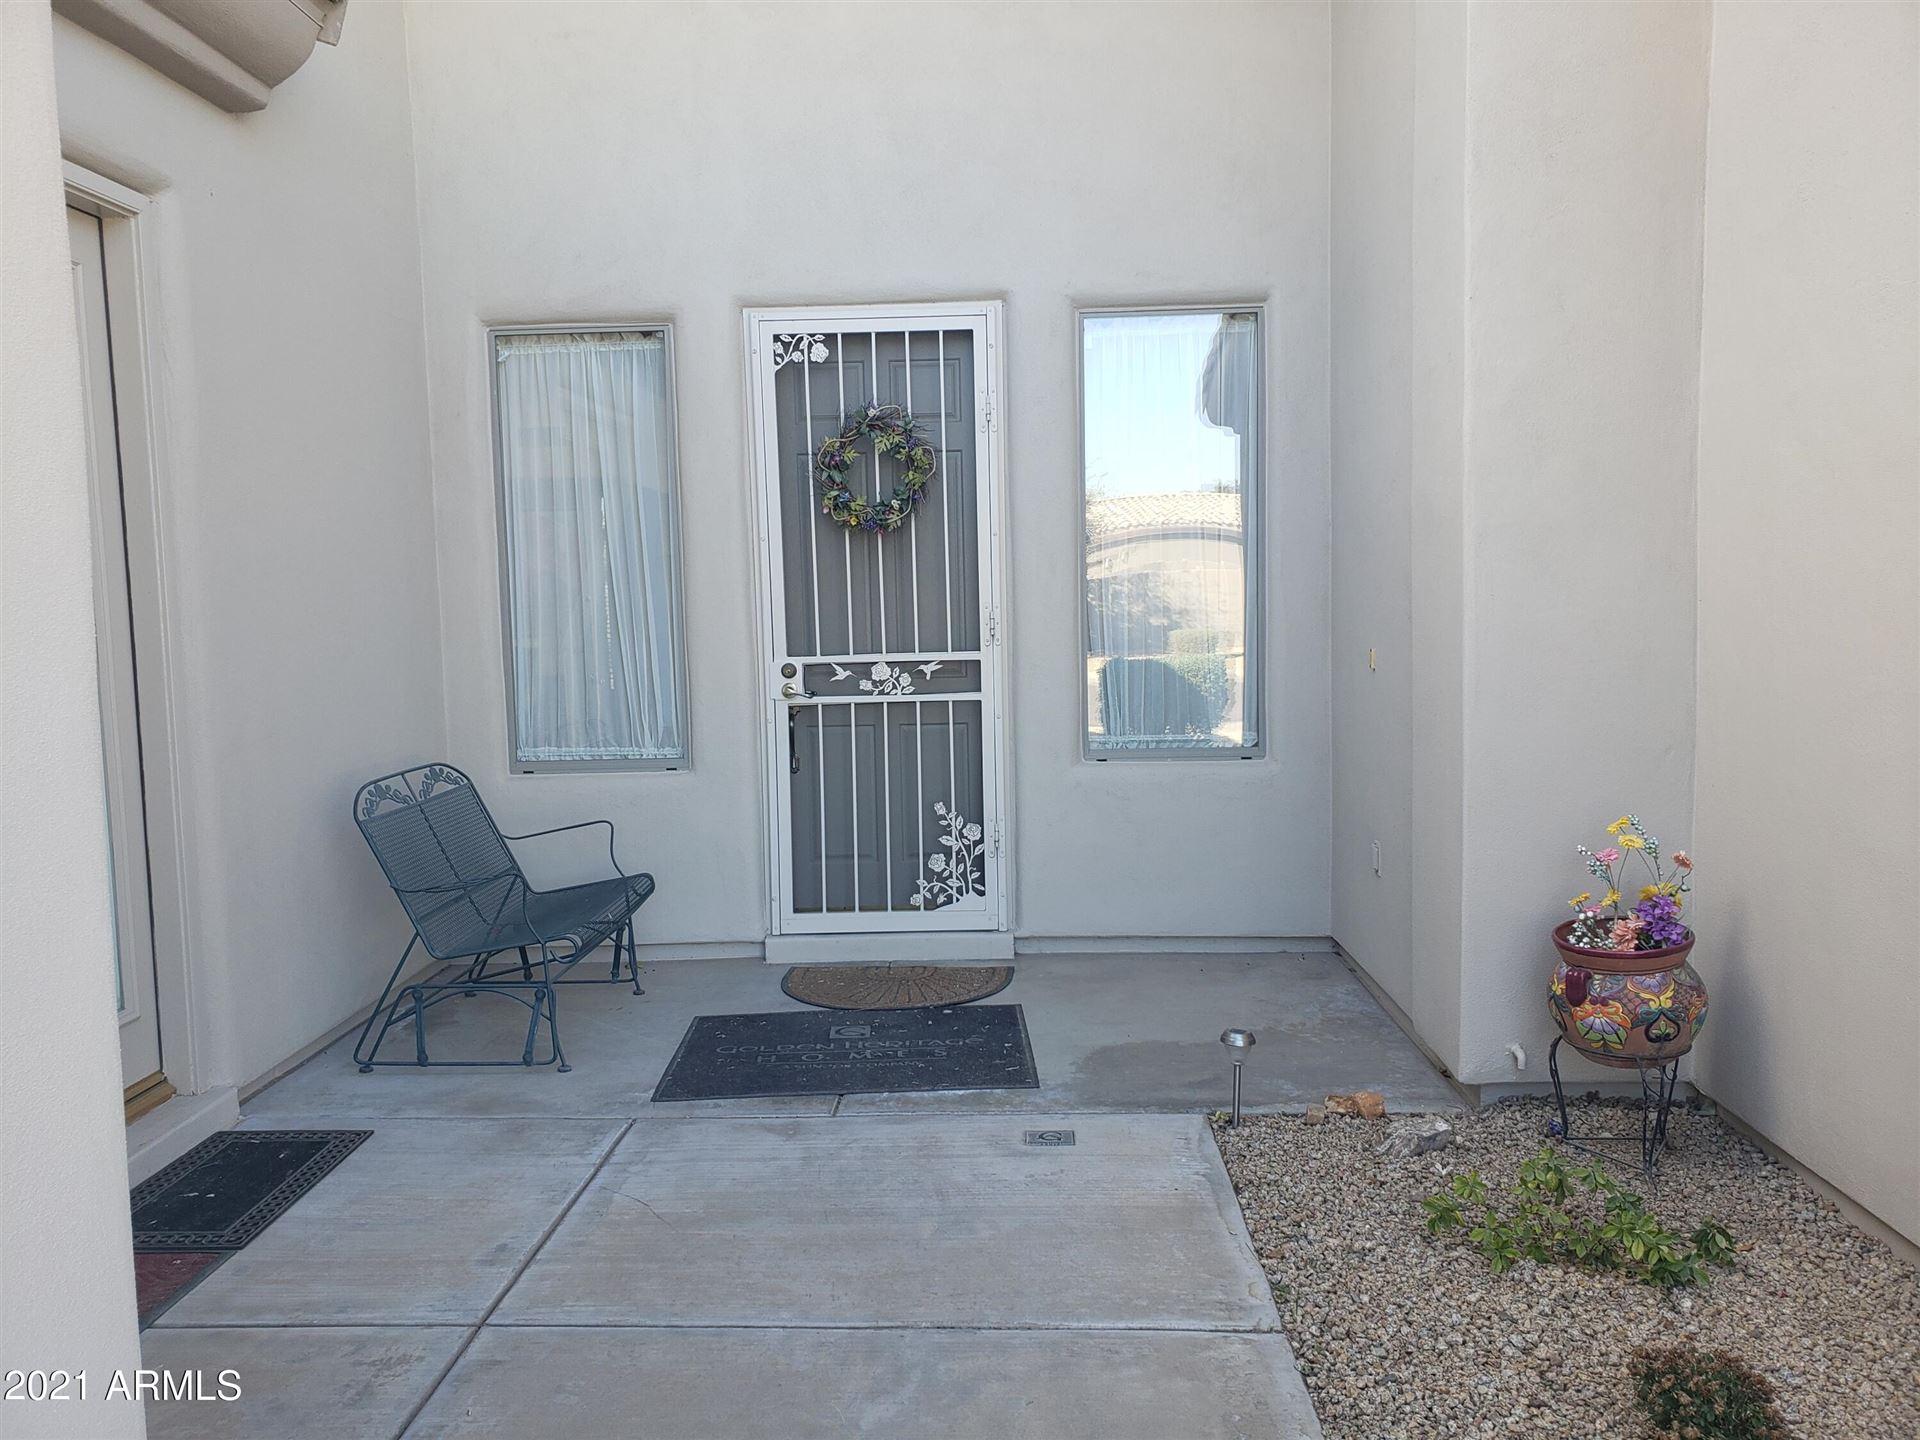 Photo of 14583 W CHEERY LYNN Drive, Goodyear, AZ 85395 (MLS # 6198835)